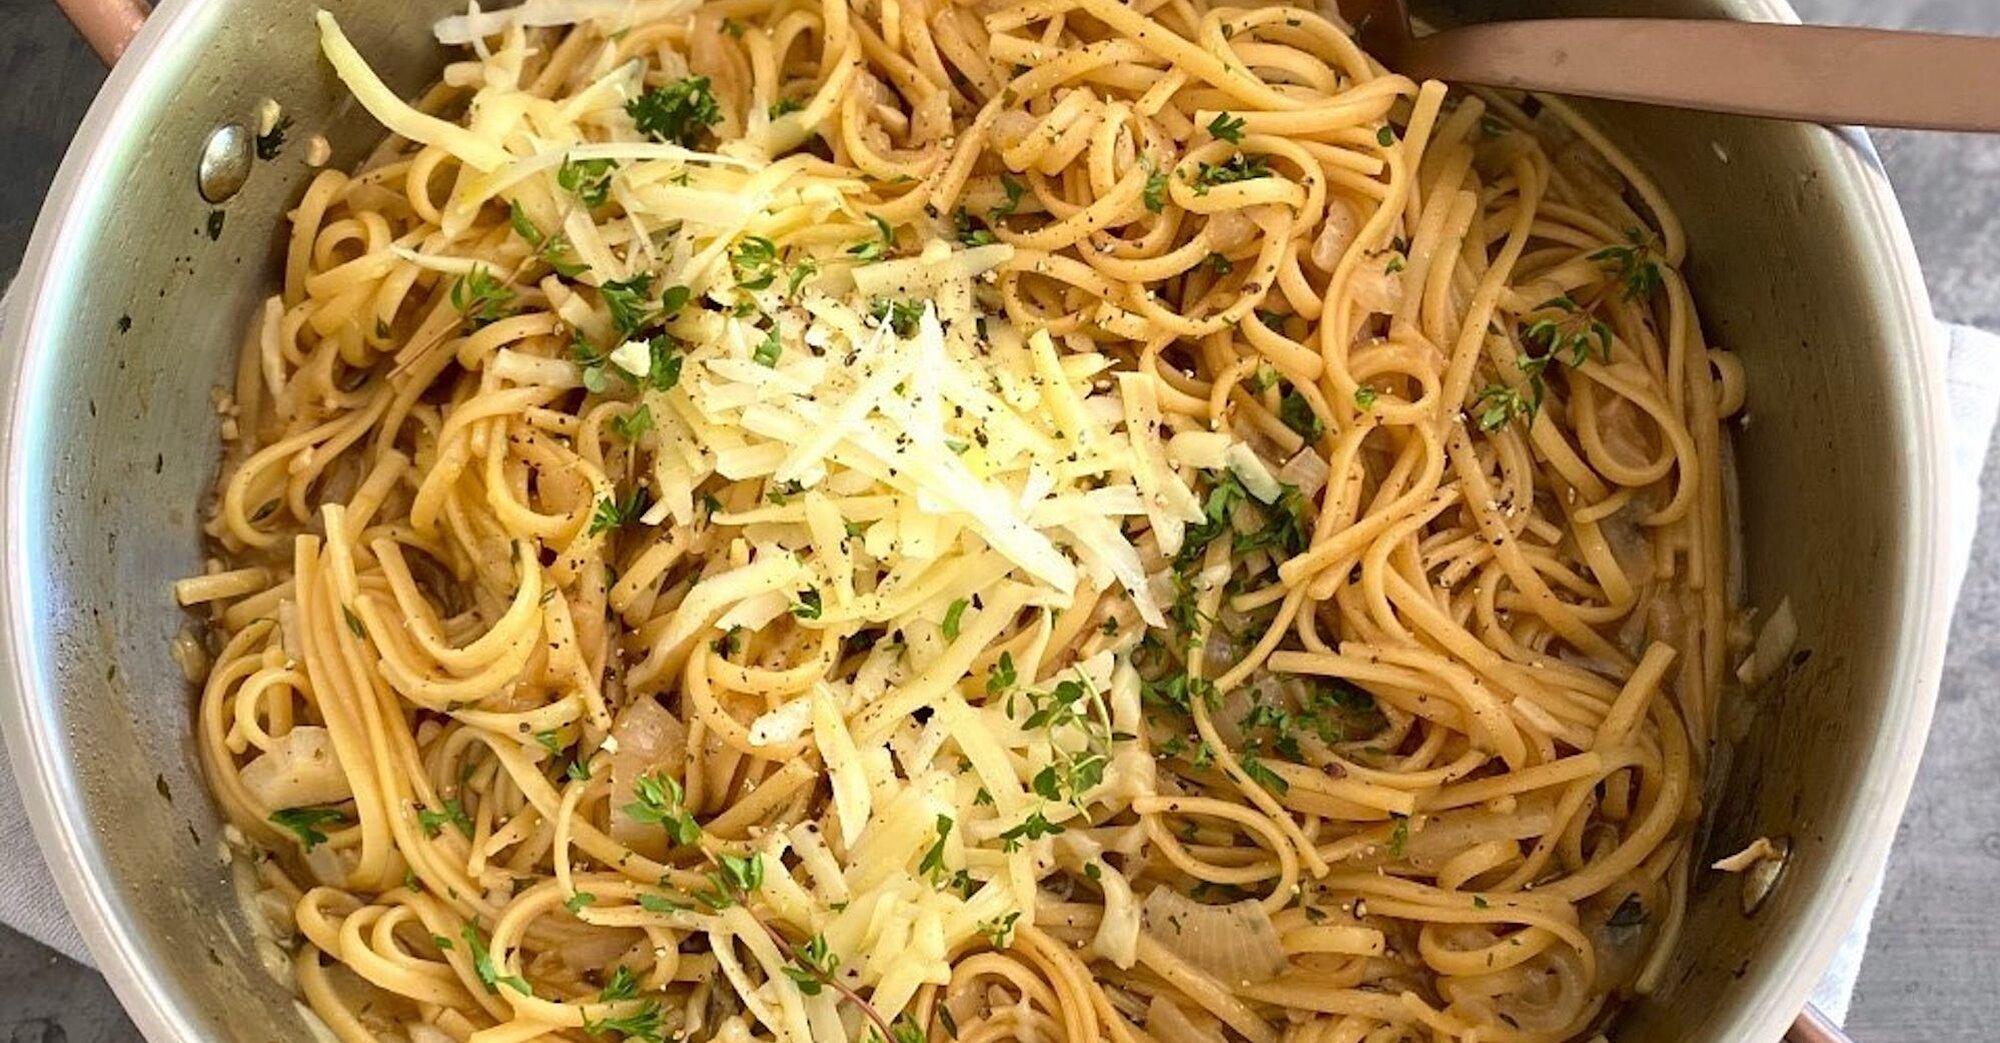 French Onion One-Pot Pasta Recipe